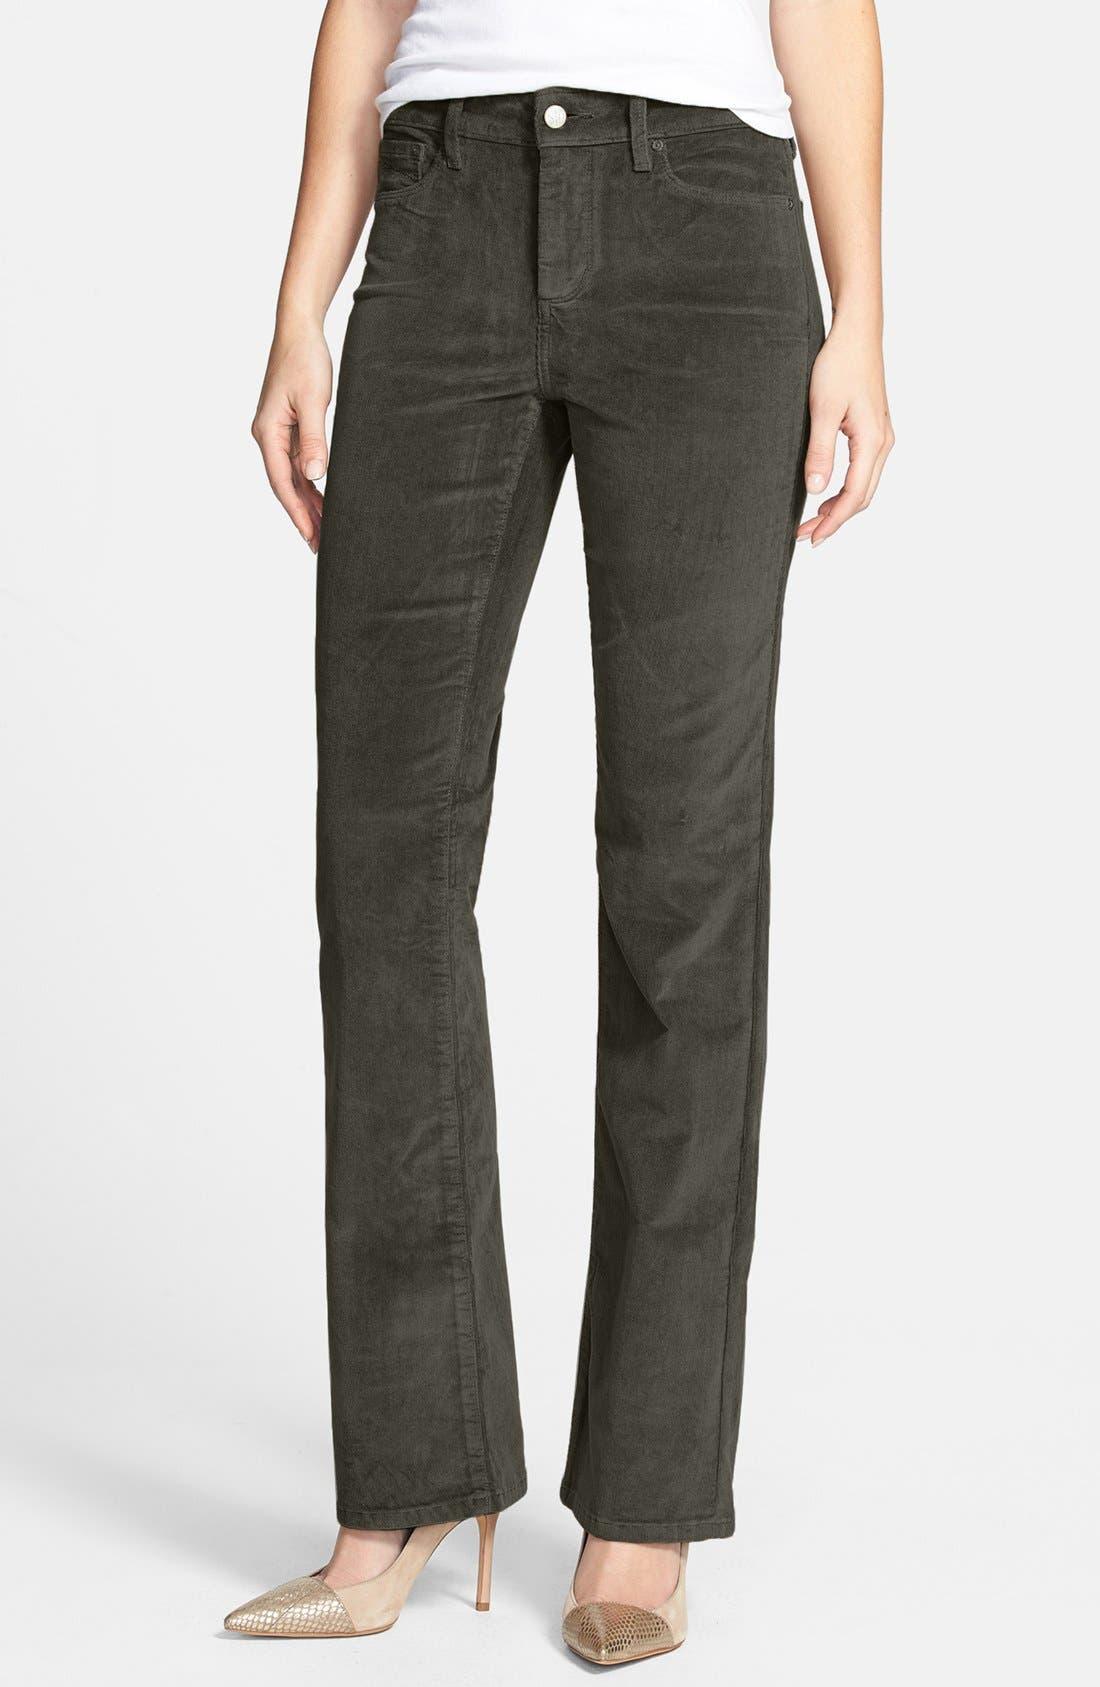 Alternate Image 1 Selected - NYDJ 'Barbara' Colored Stretch Corduroy Bootcut Pants (Regular & Petite)